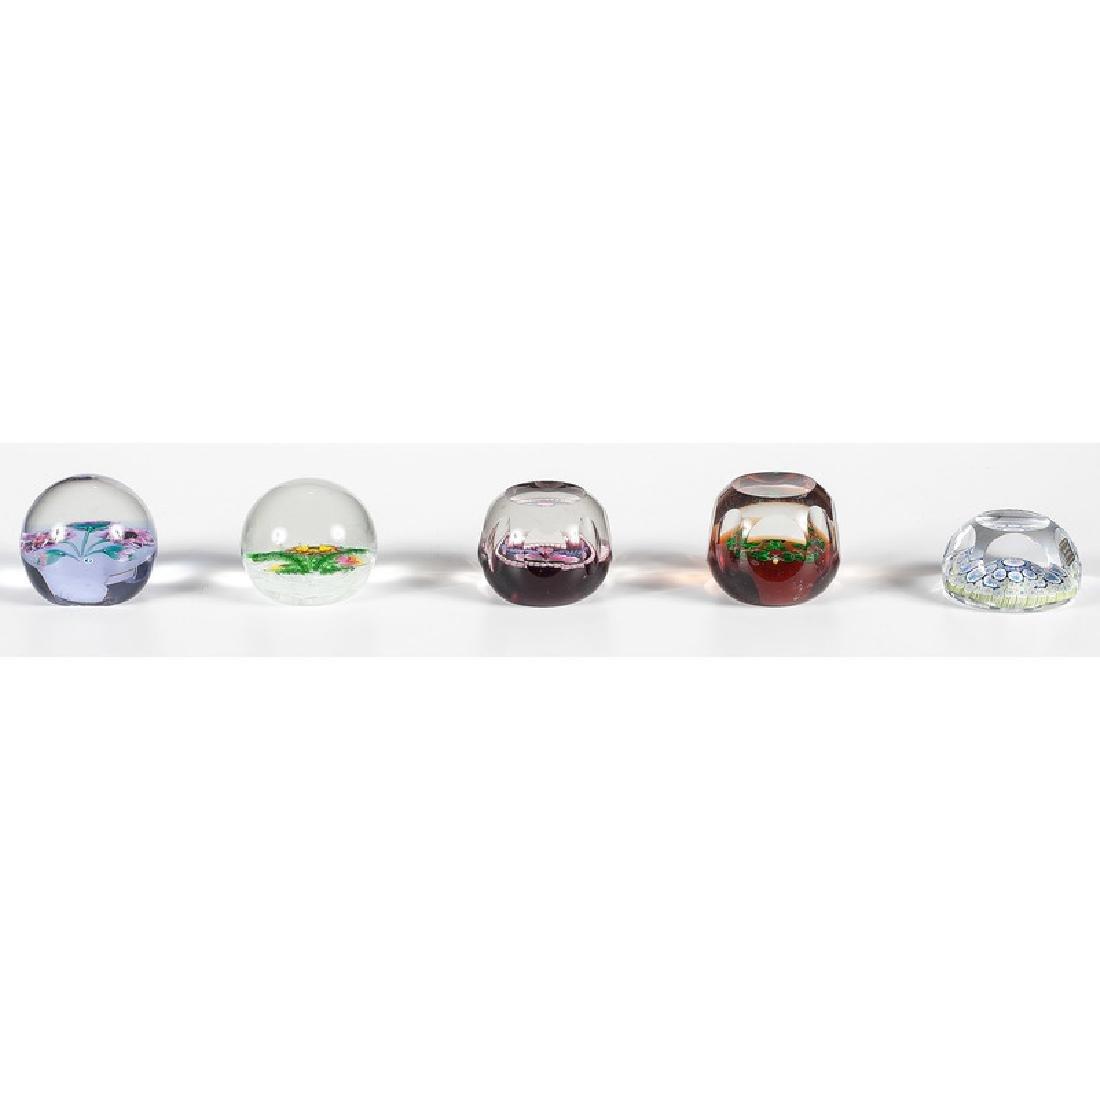 Caithness Seasonal Glass Paperweights